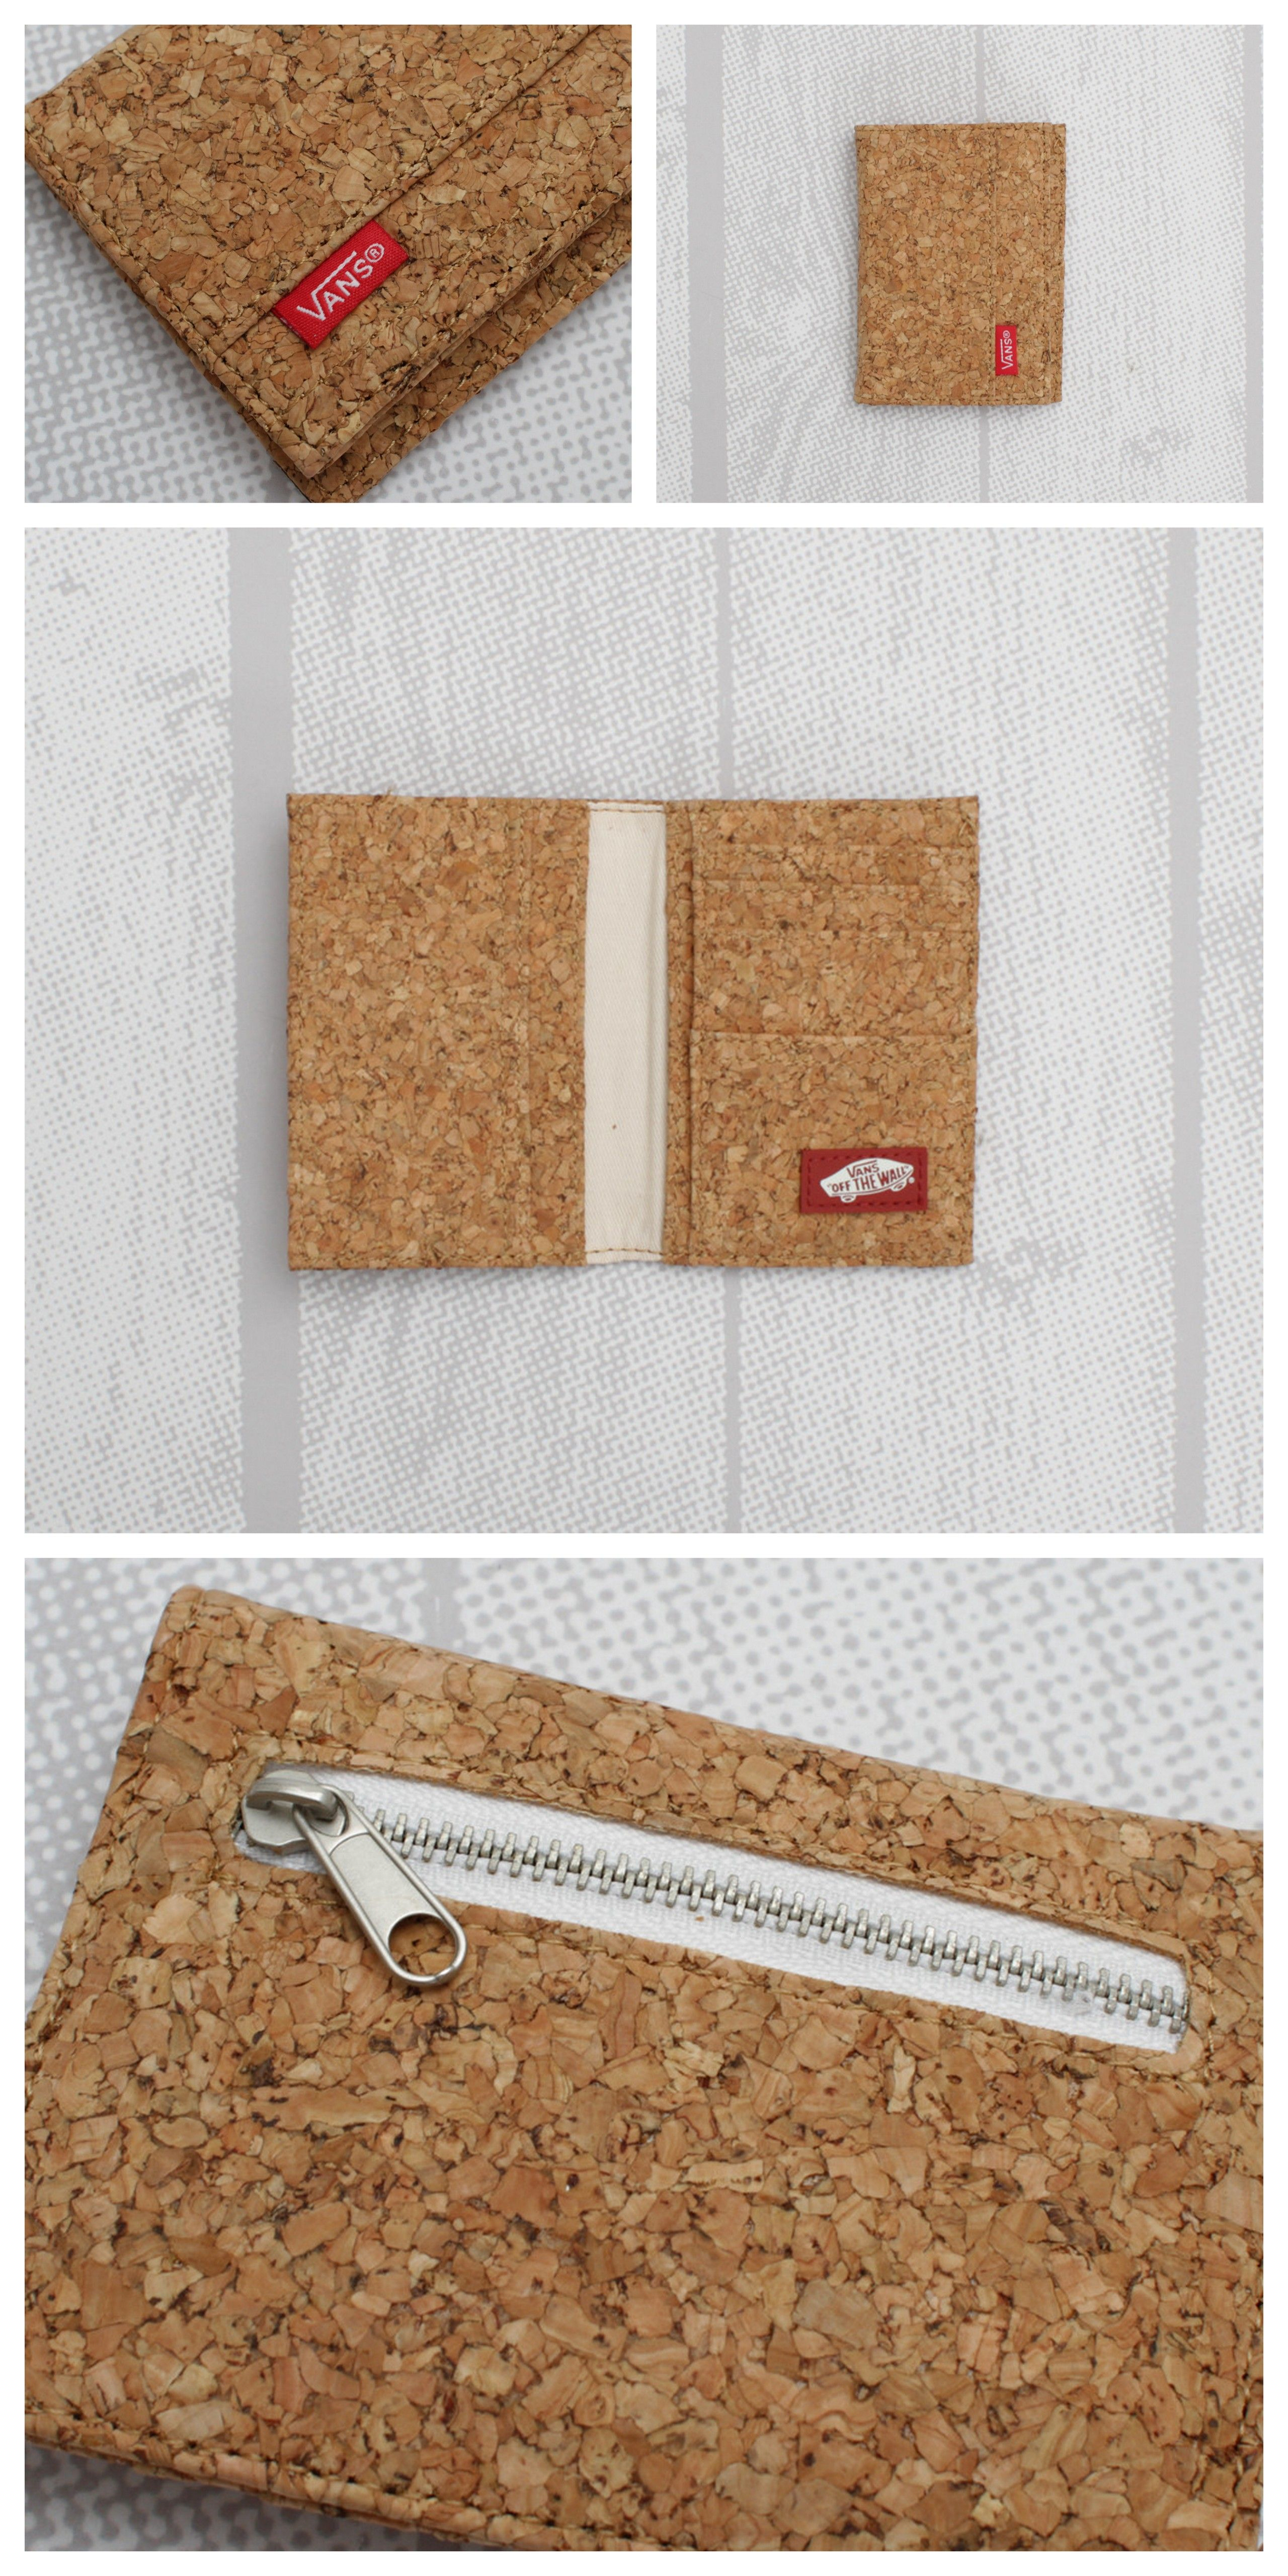 Vans Authentic Bi-fold Wallet (Cork)